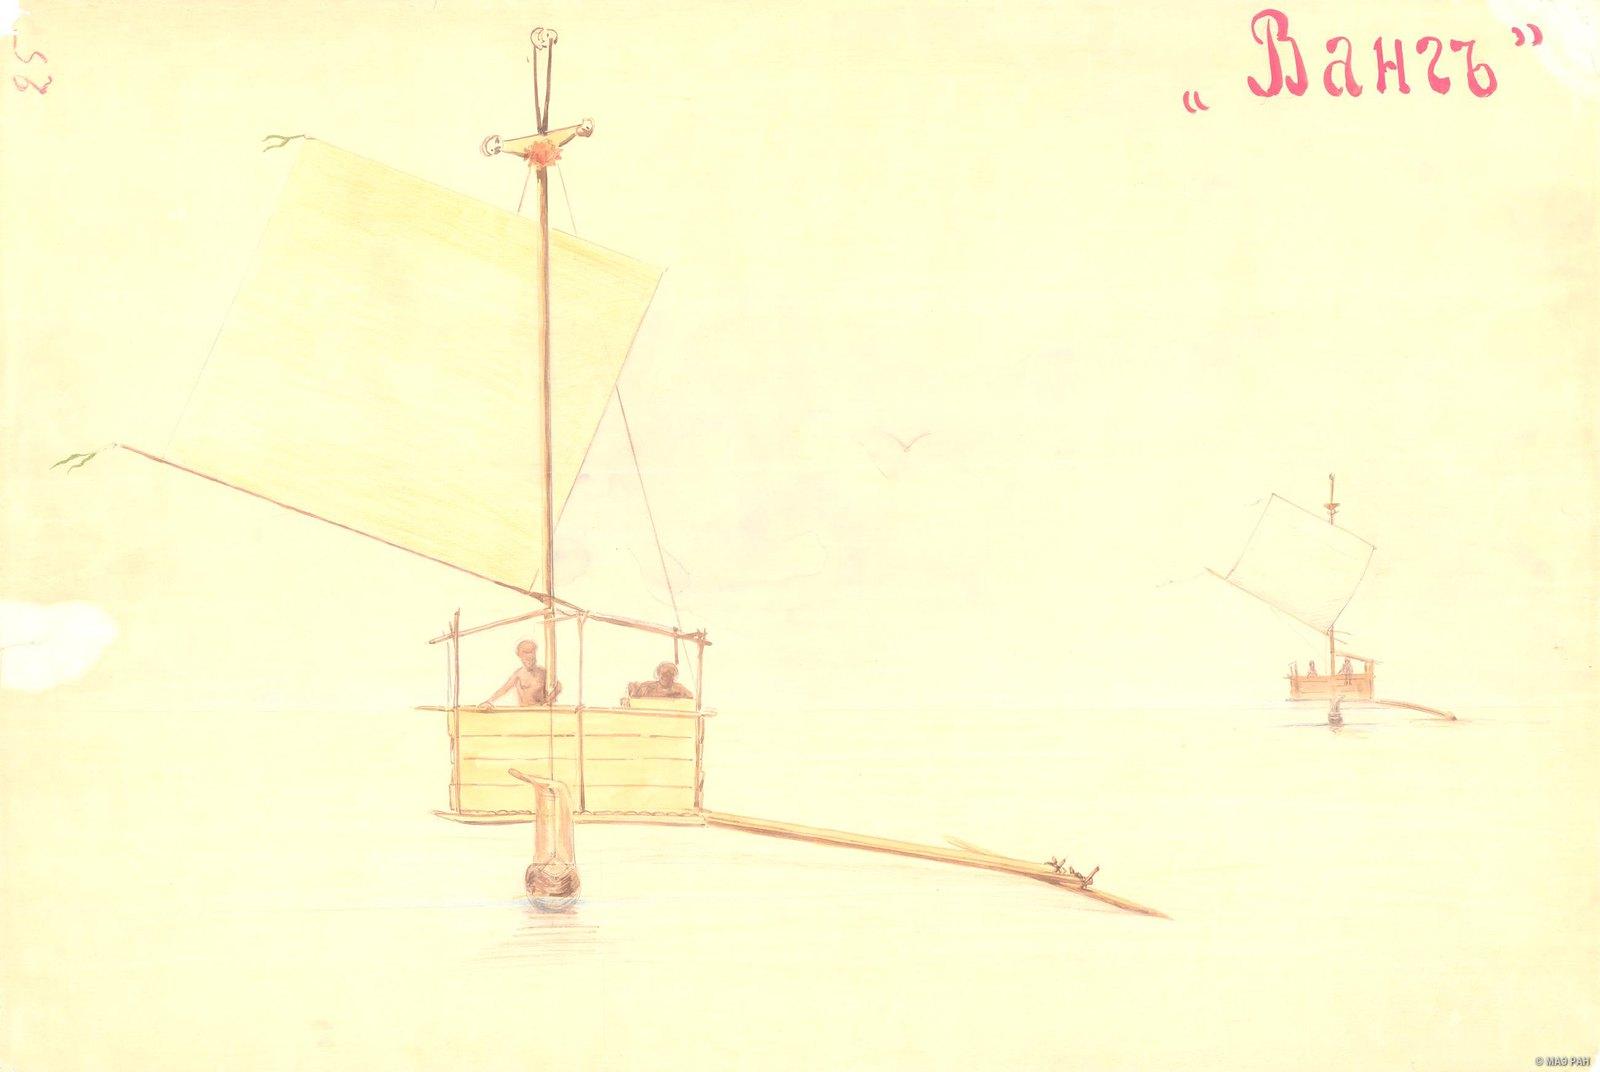 1880-е. Парусная лодка Ванг. Папуасы Новой Гвинеи.